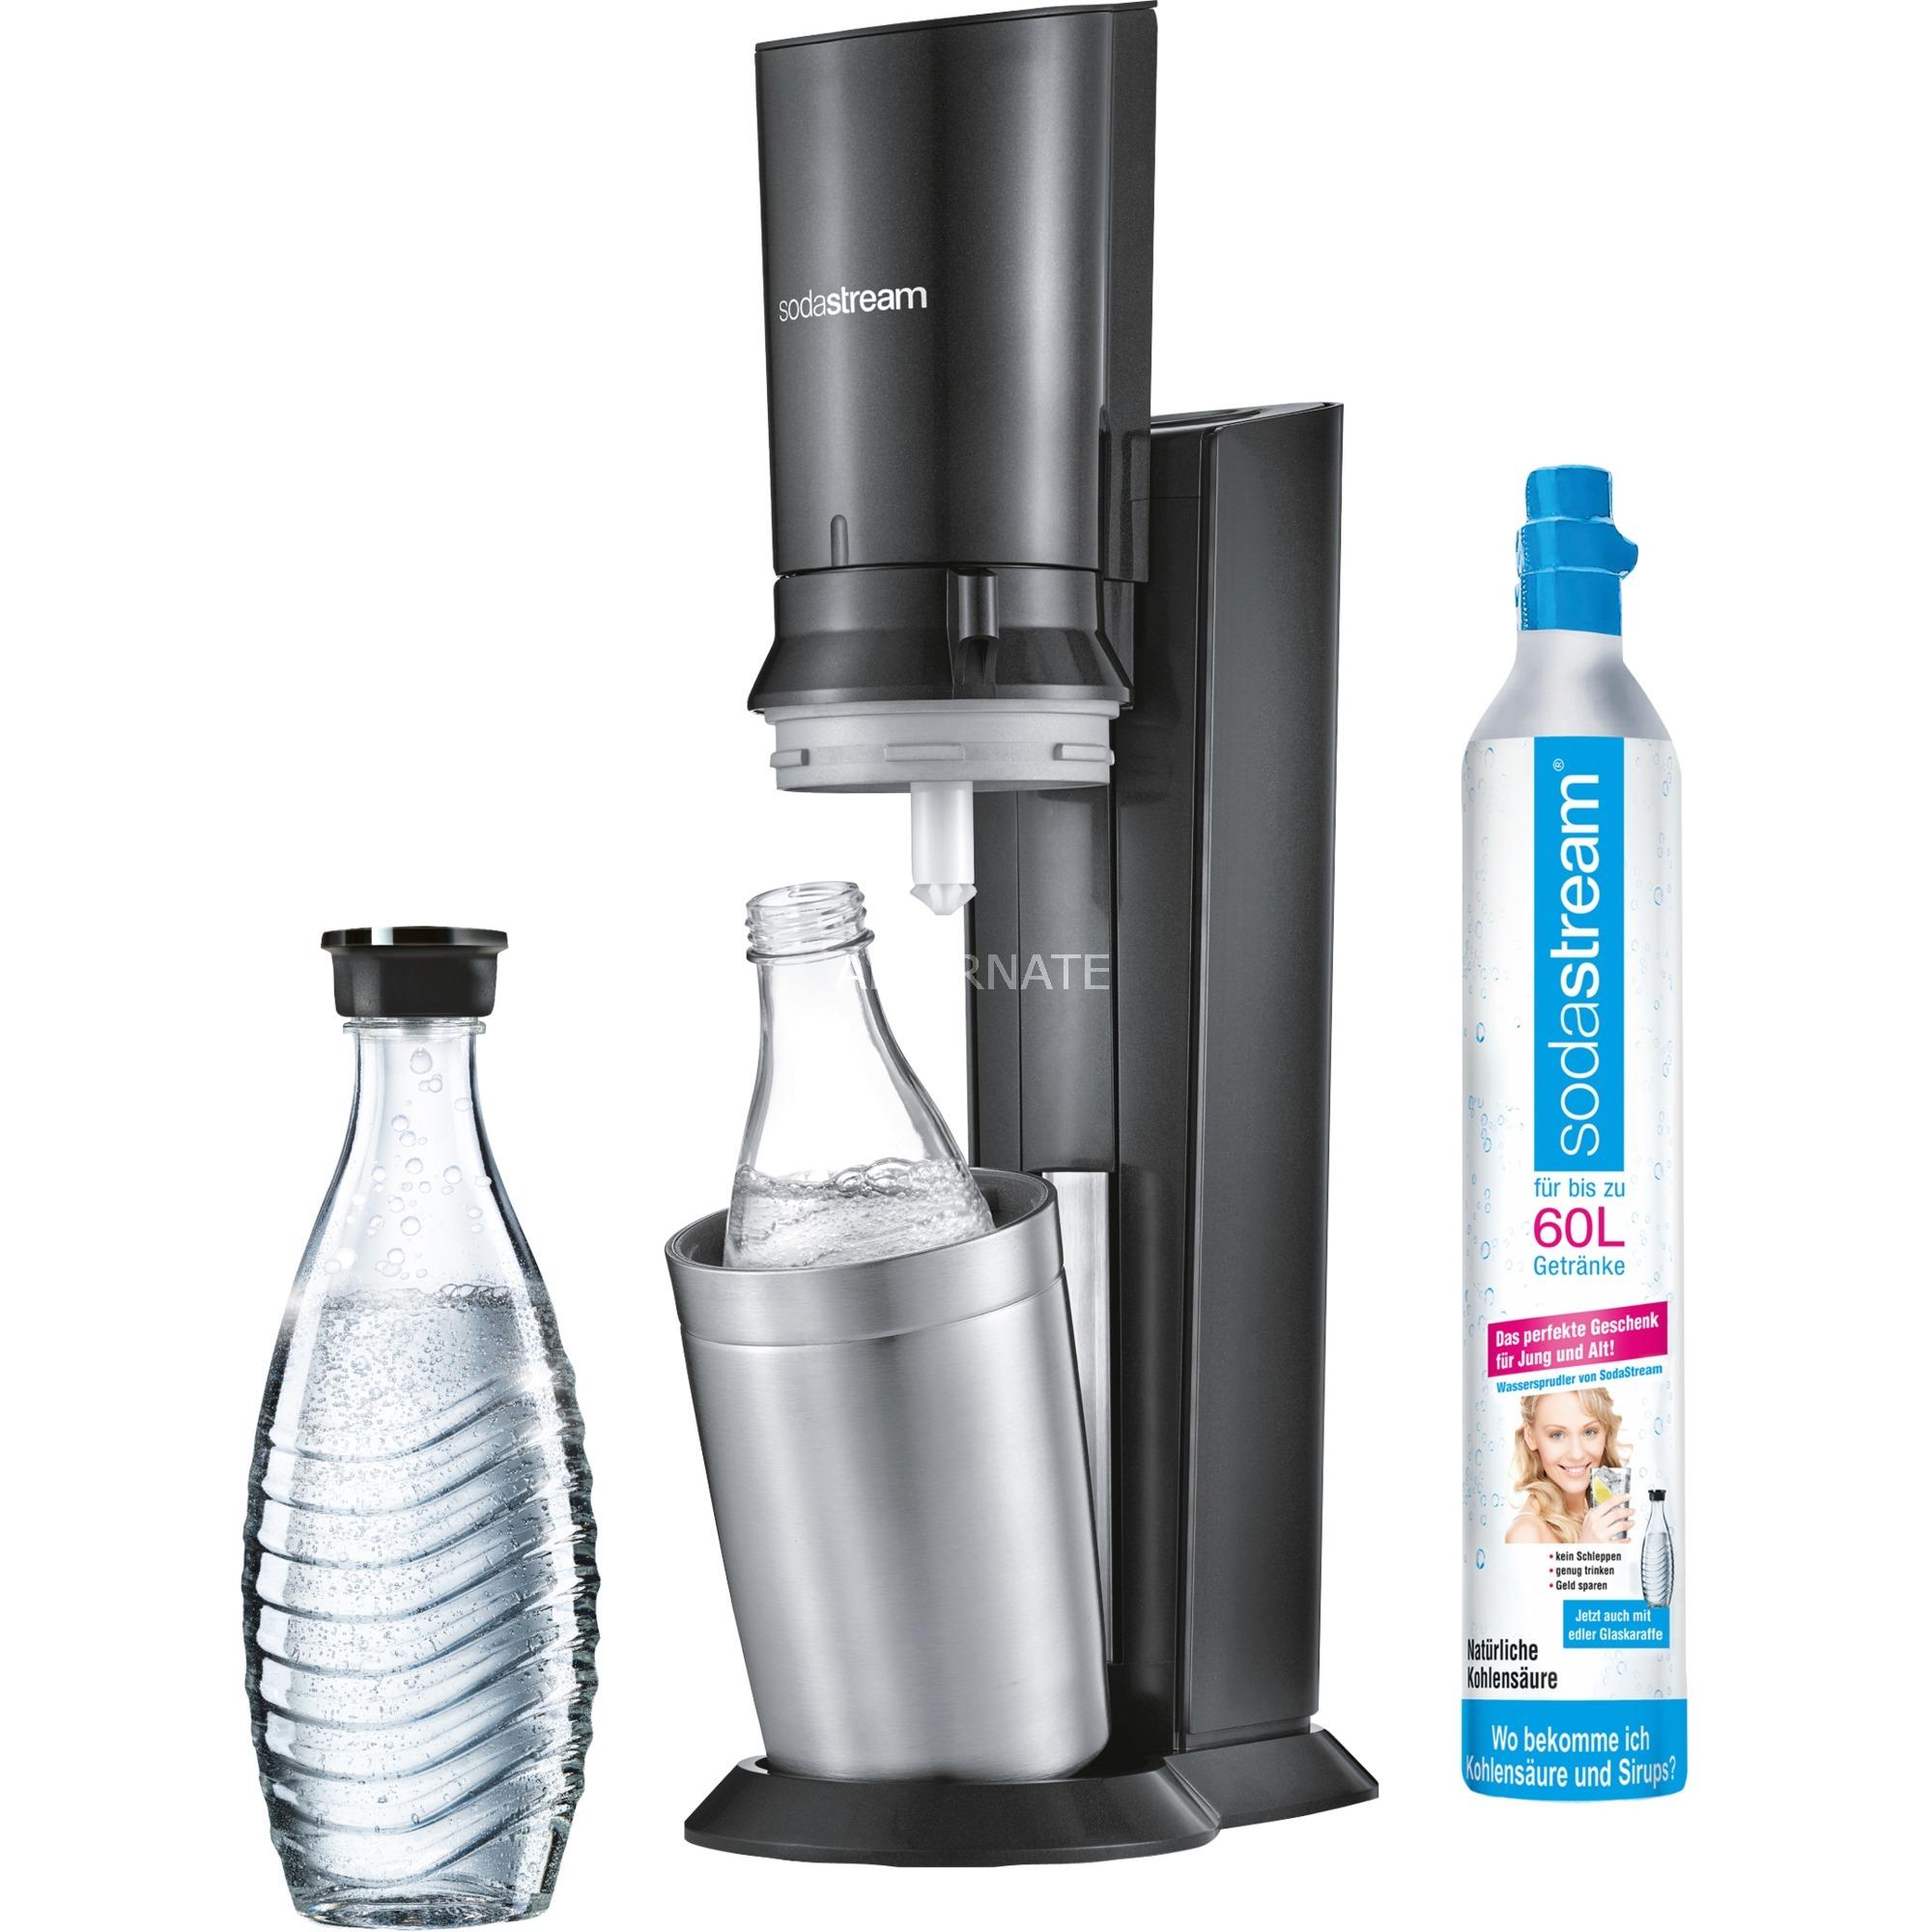 Crystal 2.0 Plata, Titanio, Gasificador de agua